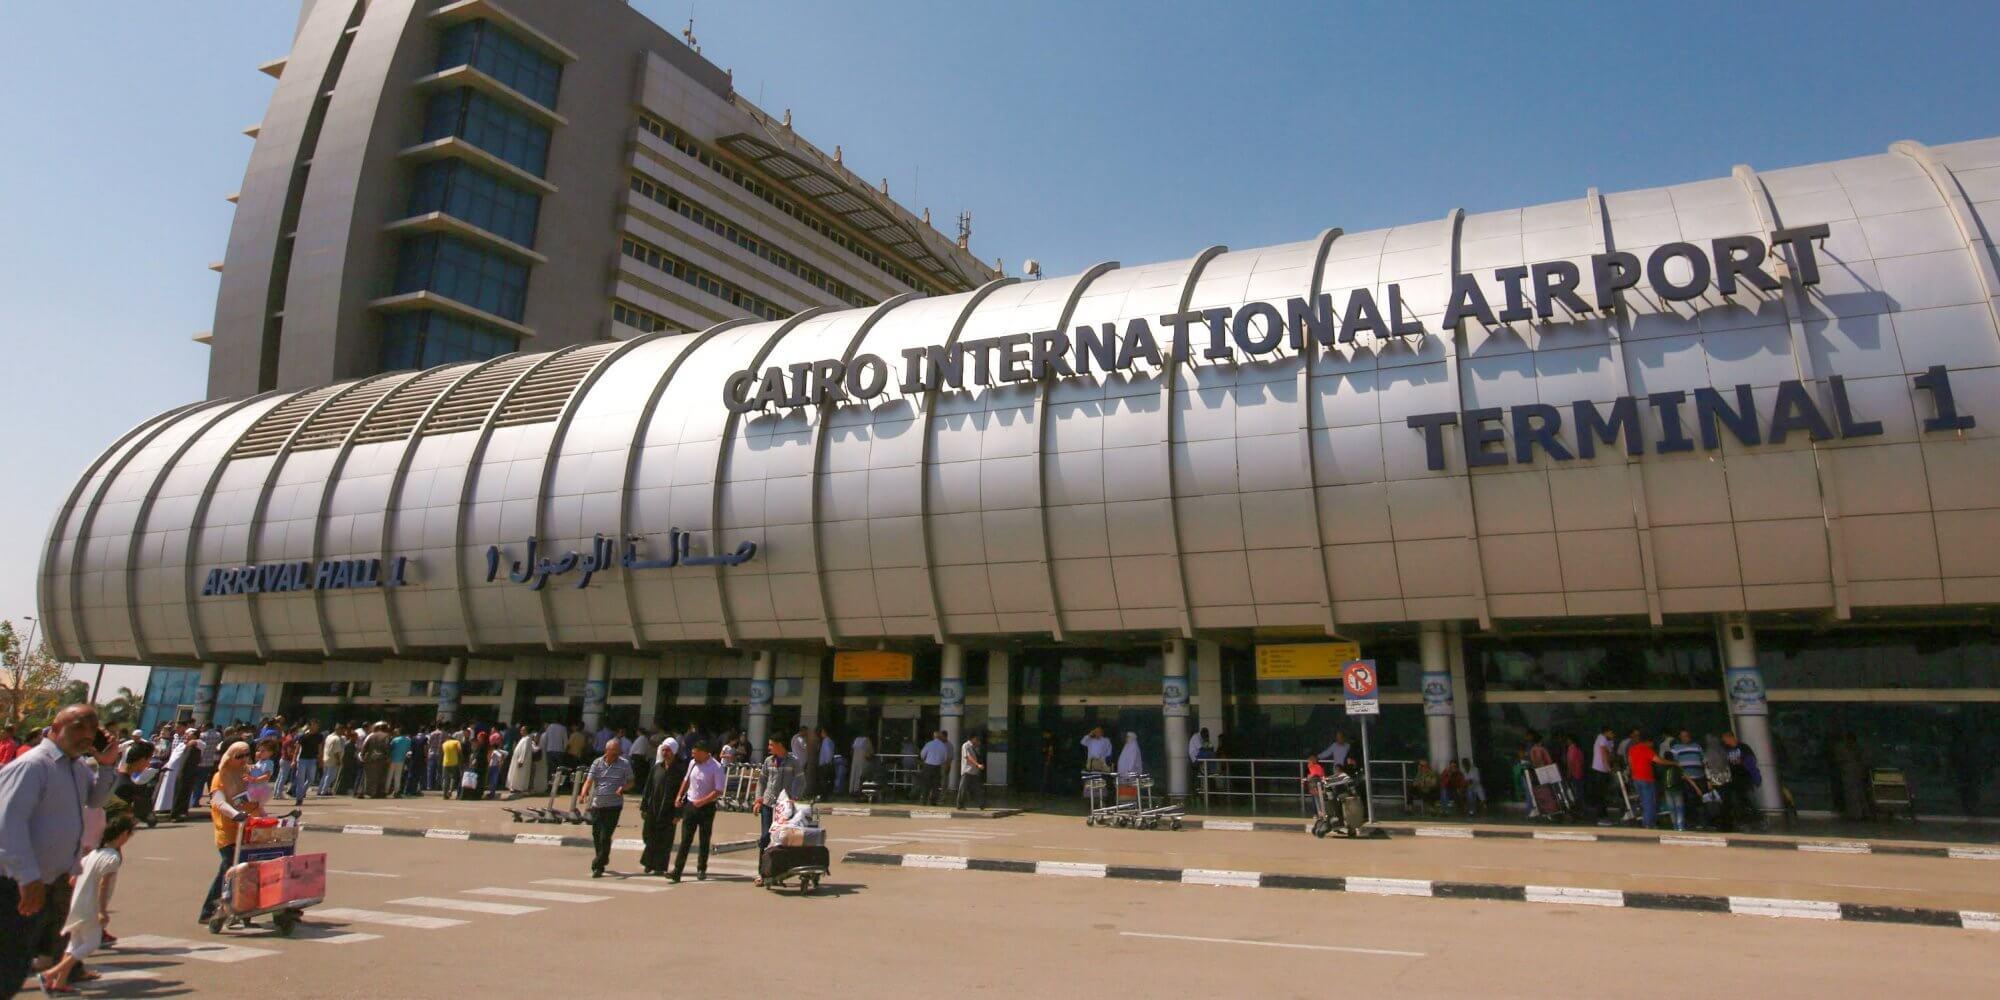 Terminal 1 of Cairo International Airport.